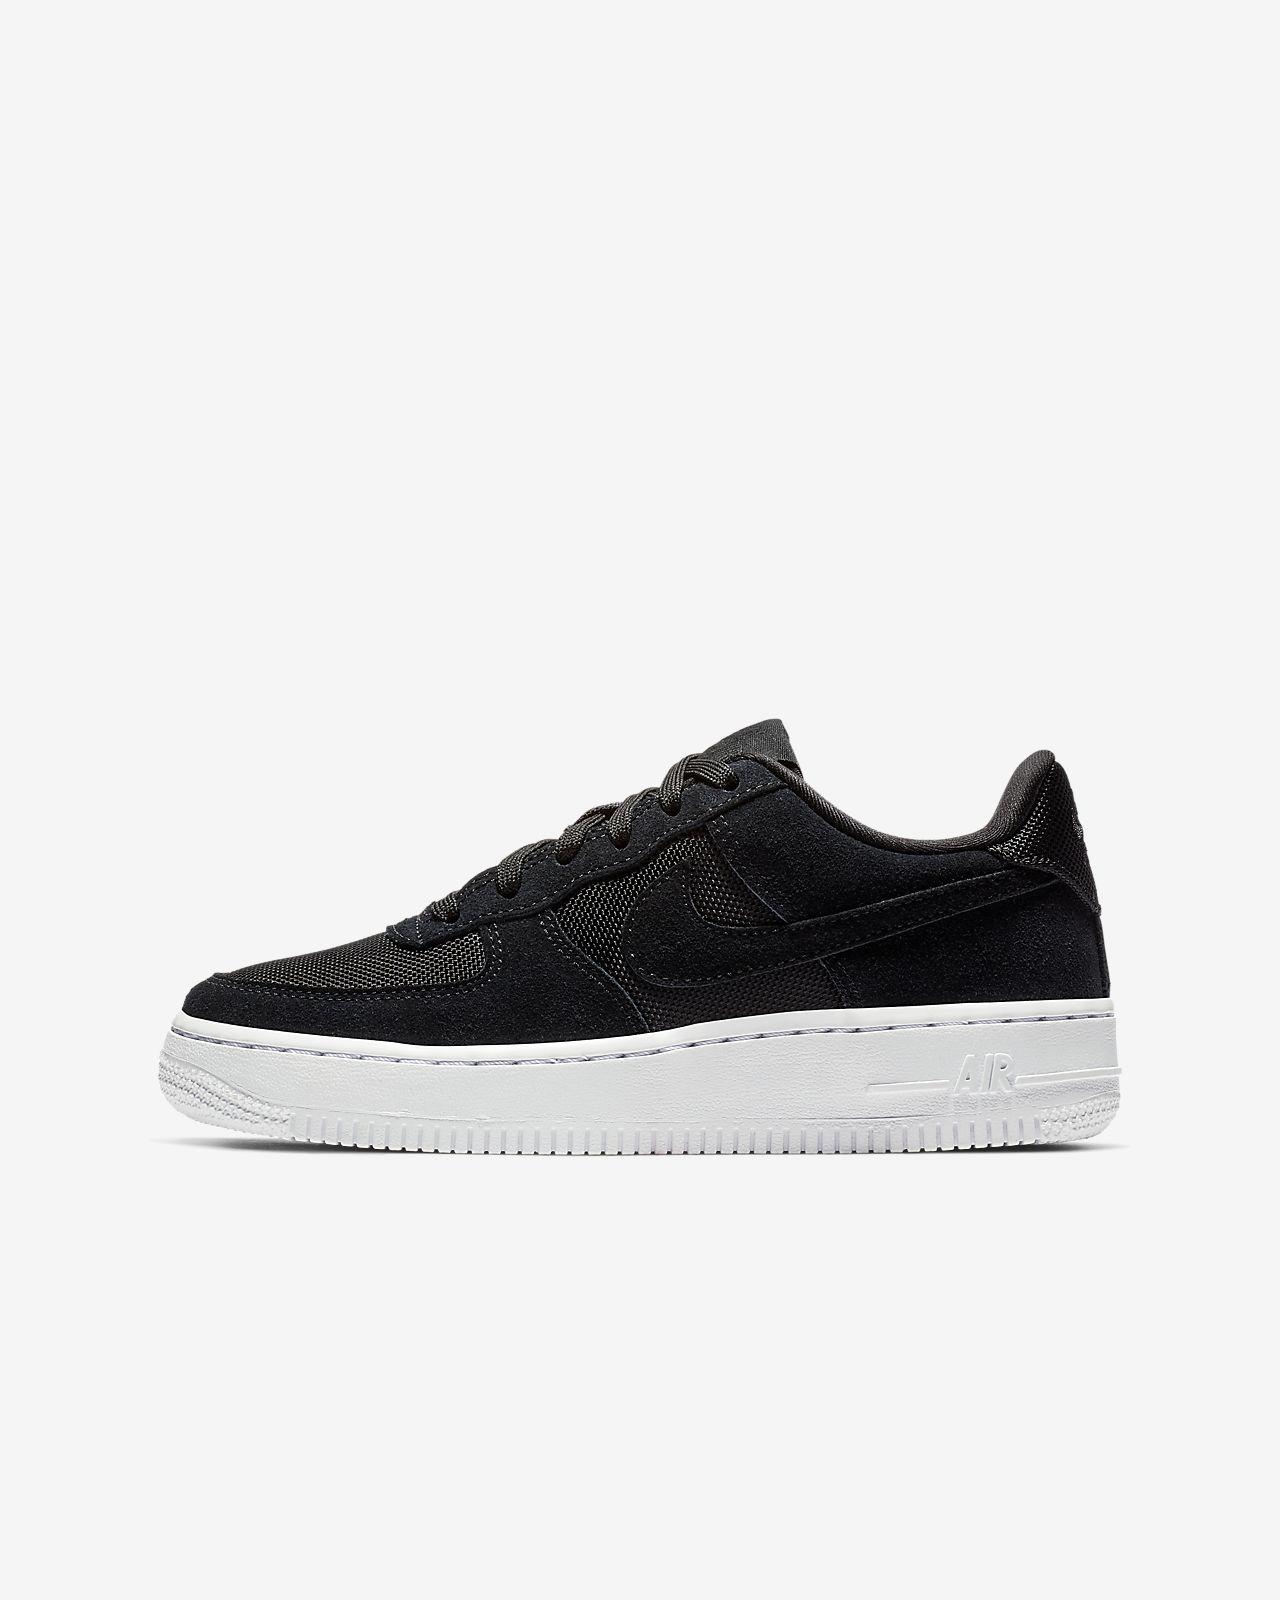 Nike Air Force 1-1 Schuh für ältere Kinder